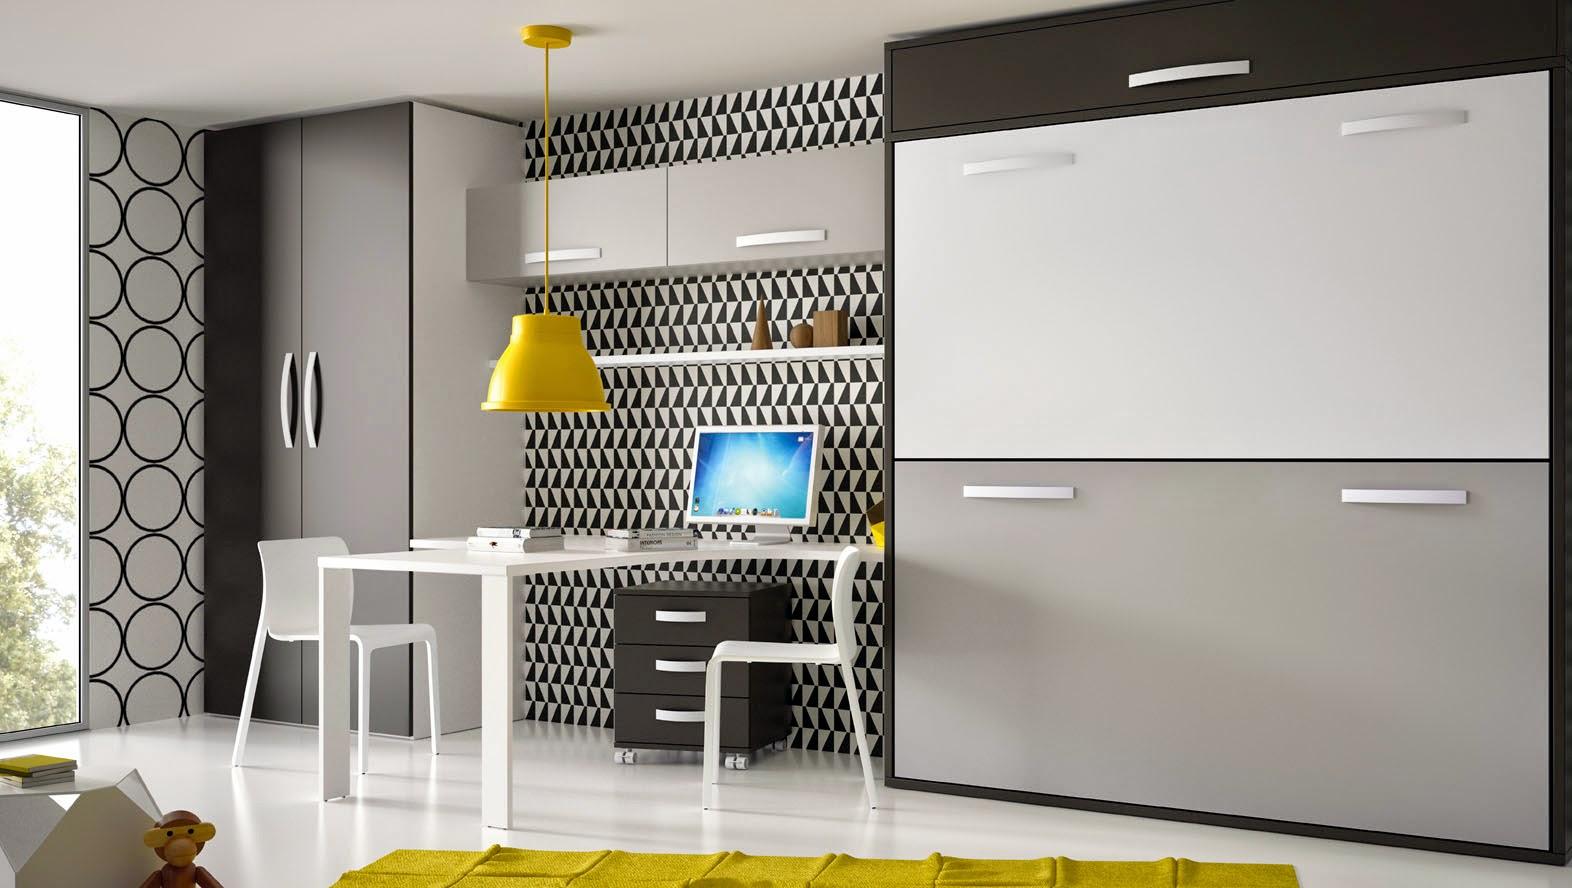 Consejos para decorar dormitorios infantiles idealiza for Dormitorios juveniles dos camas en l